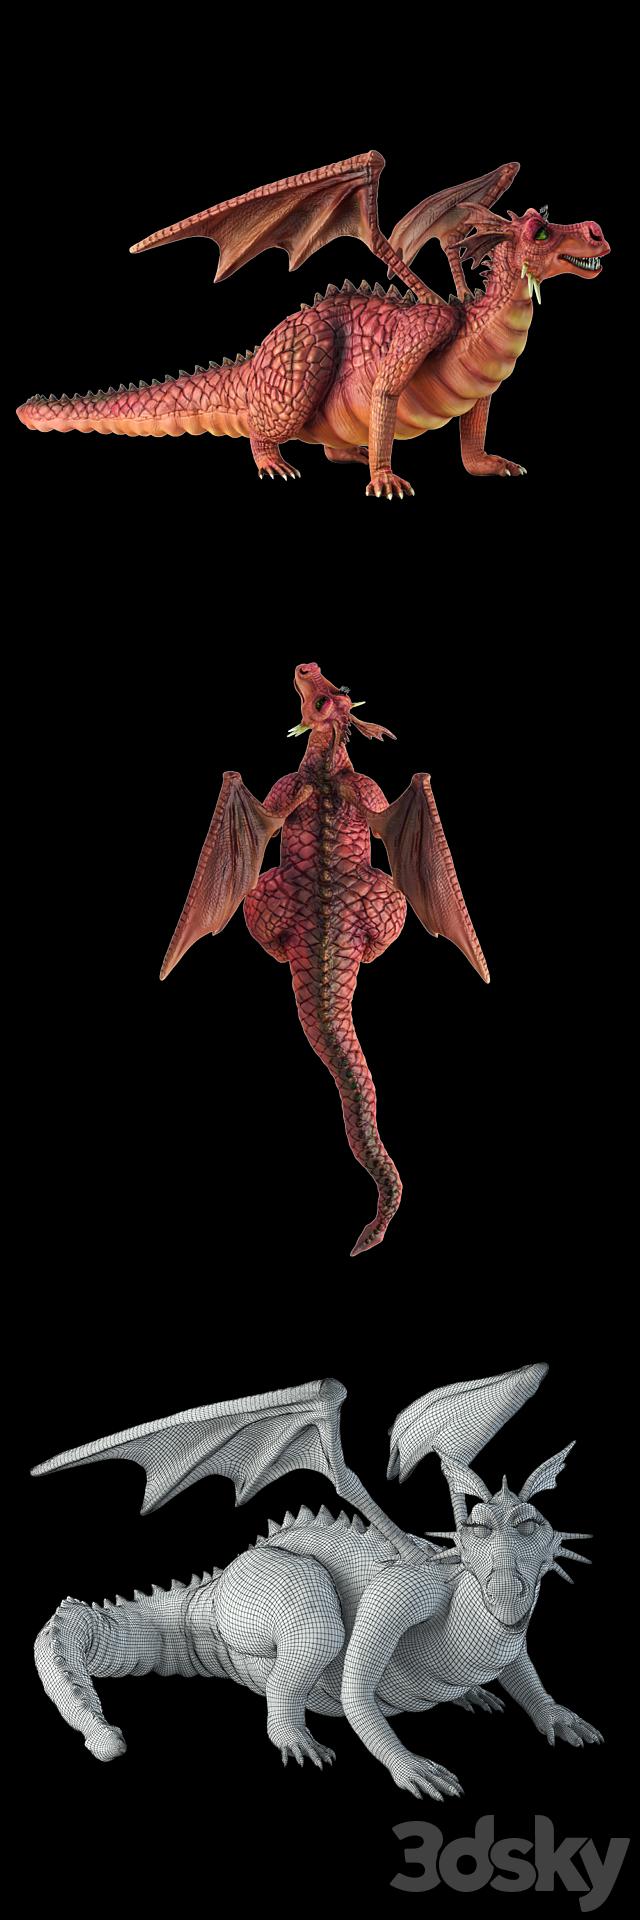 The dragon from the cartoon Shrek